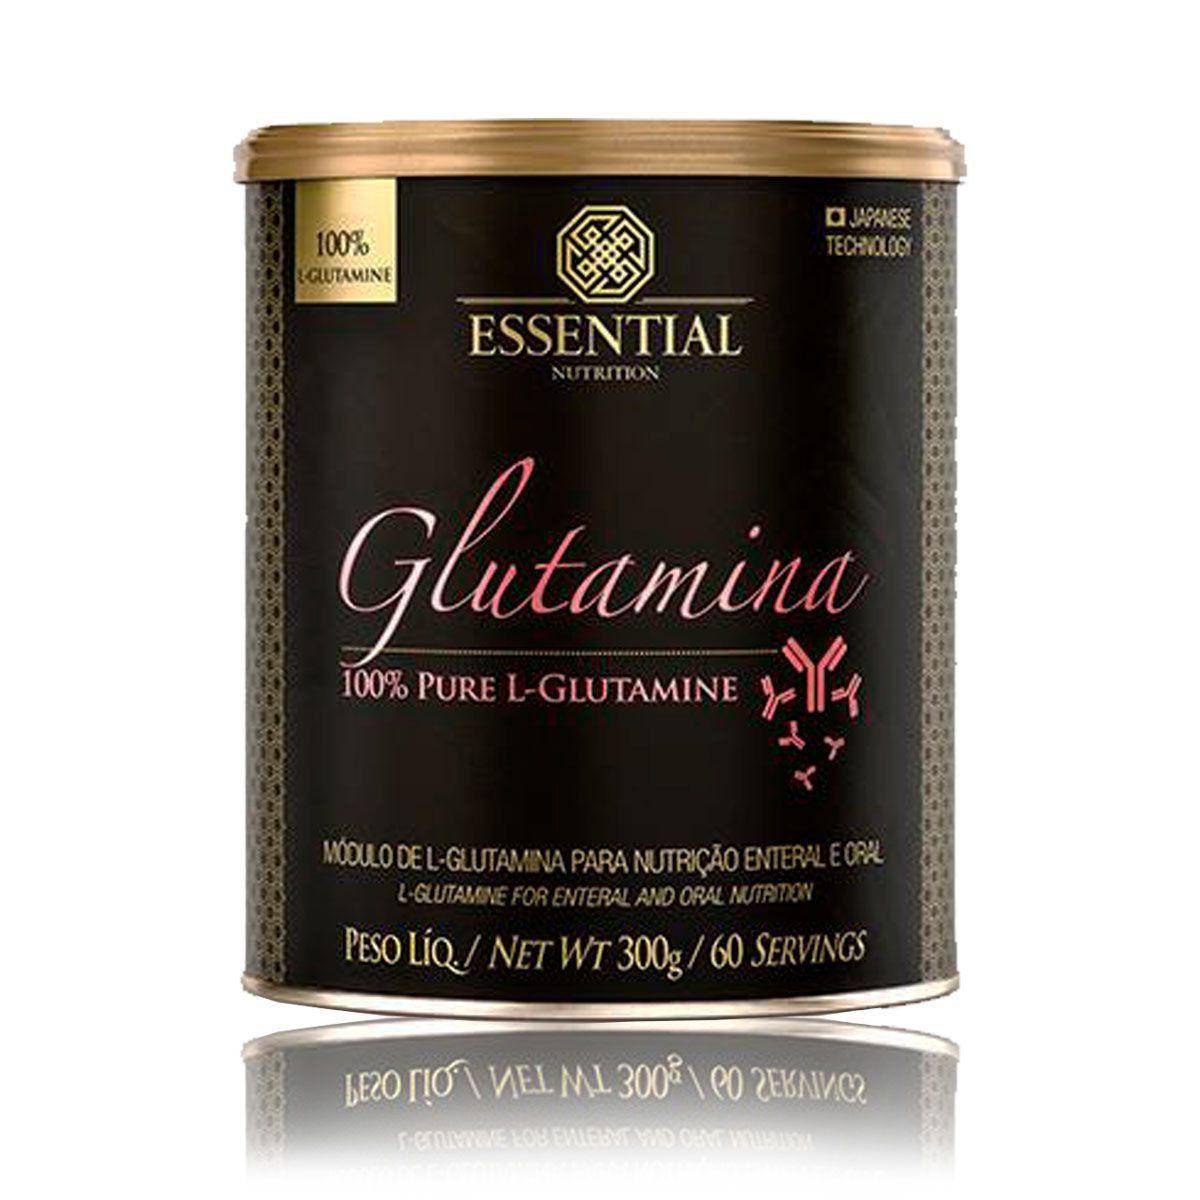 Glutamina 300g /60 doses Essential nutrition